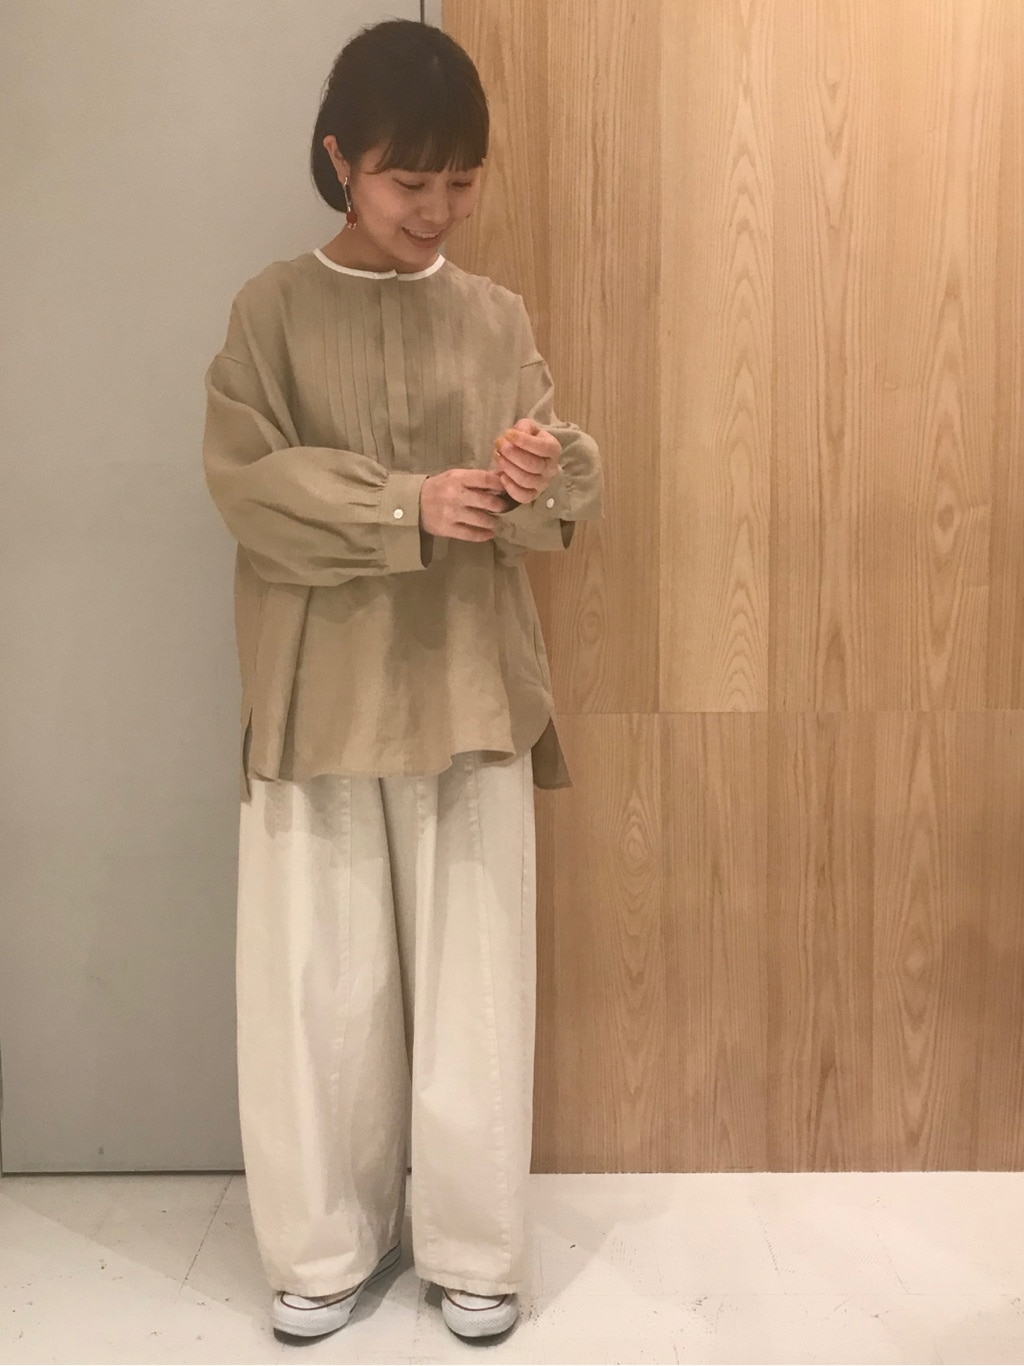 bulle de savon なんばシティ 身長:149cm 2020.03.31